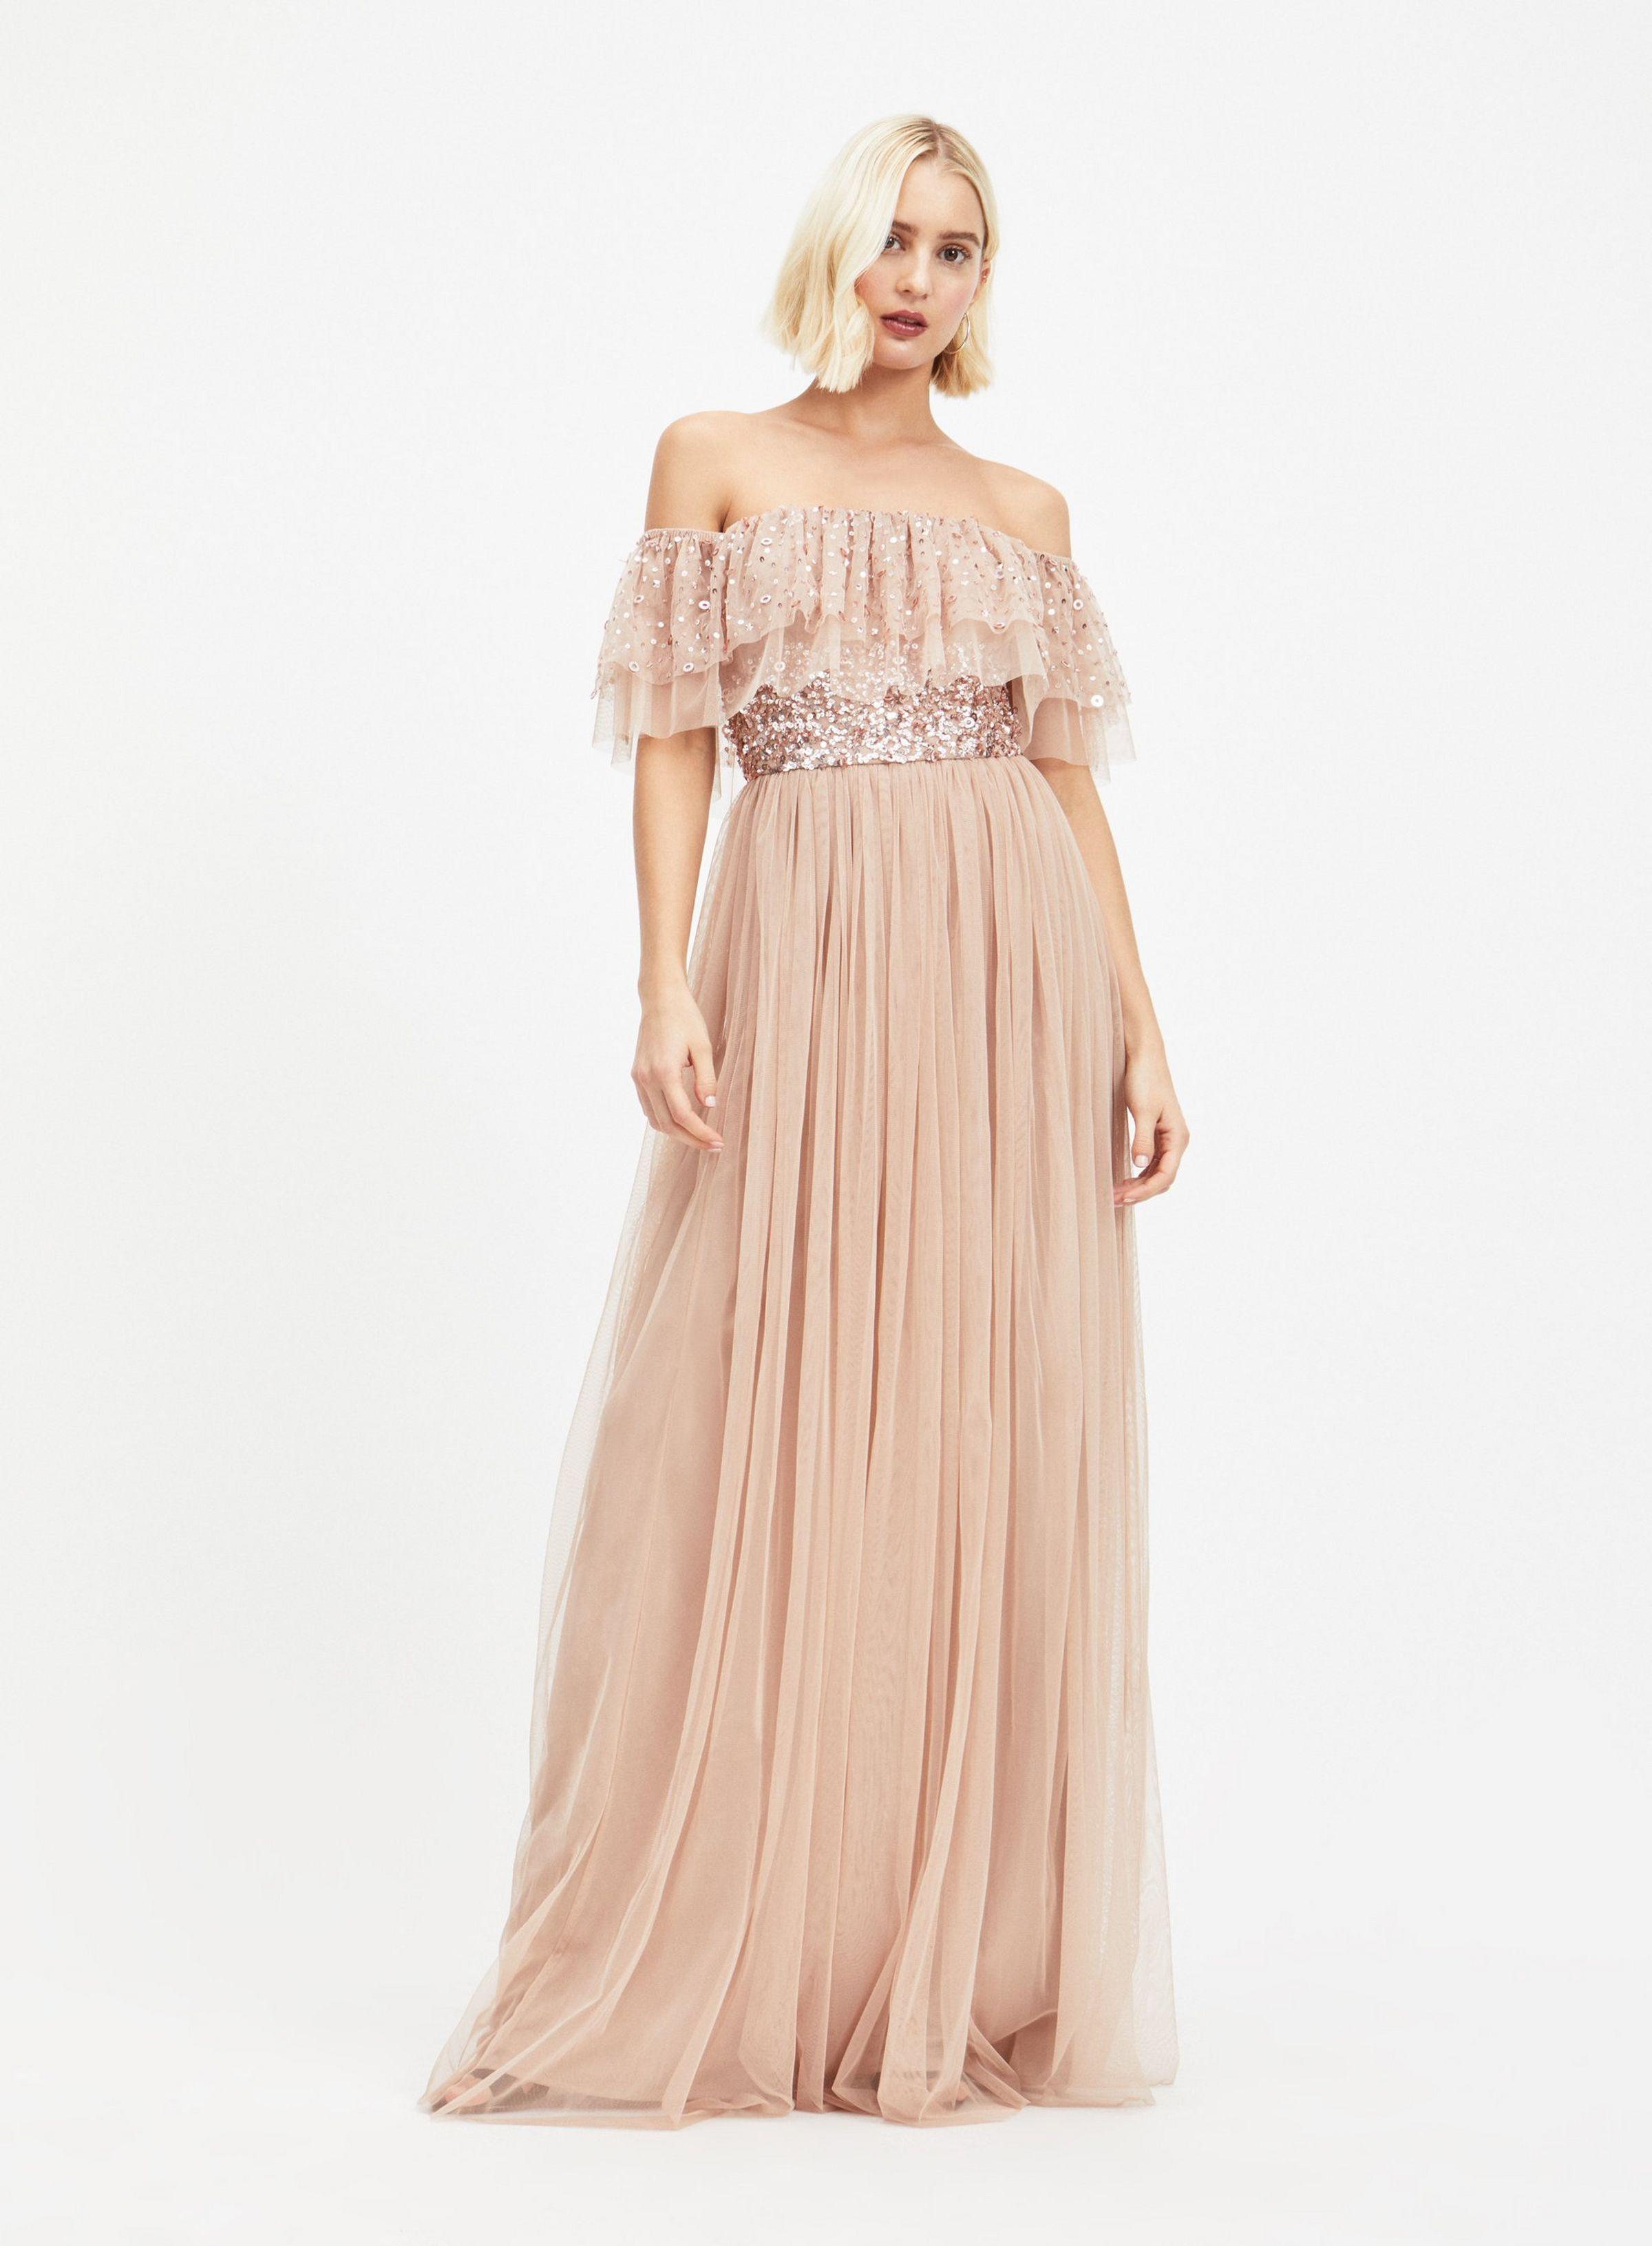 42bbfd590d6 Genuine Prom Dress Websites Uk